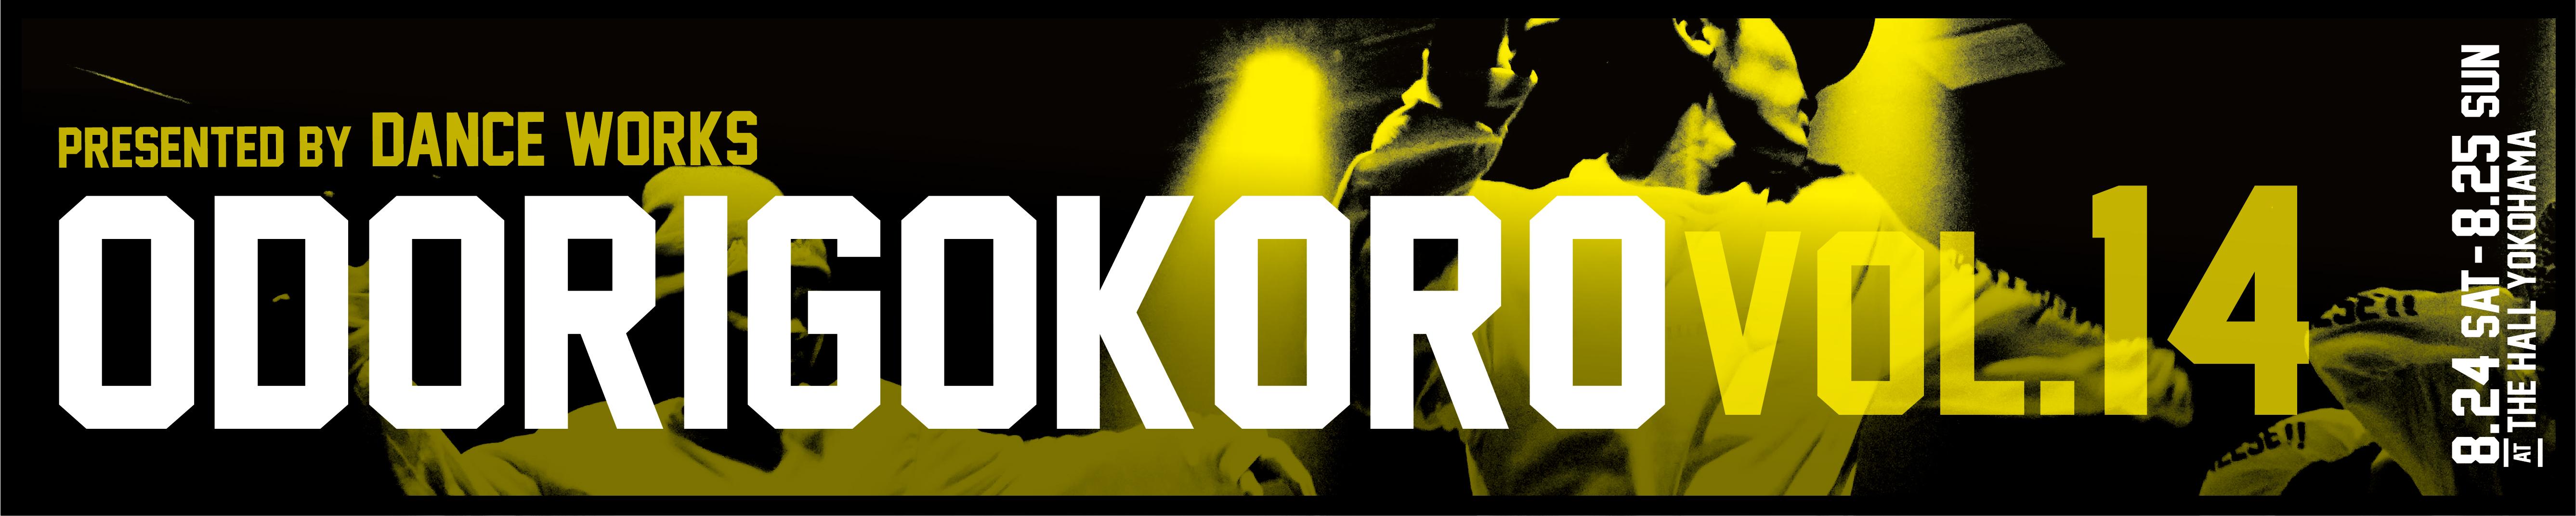 ODORIGOKORO vol.14 ギャラリー